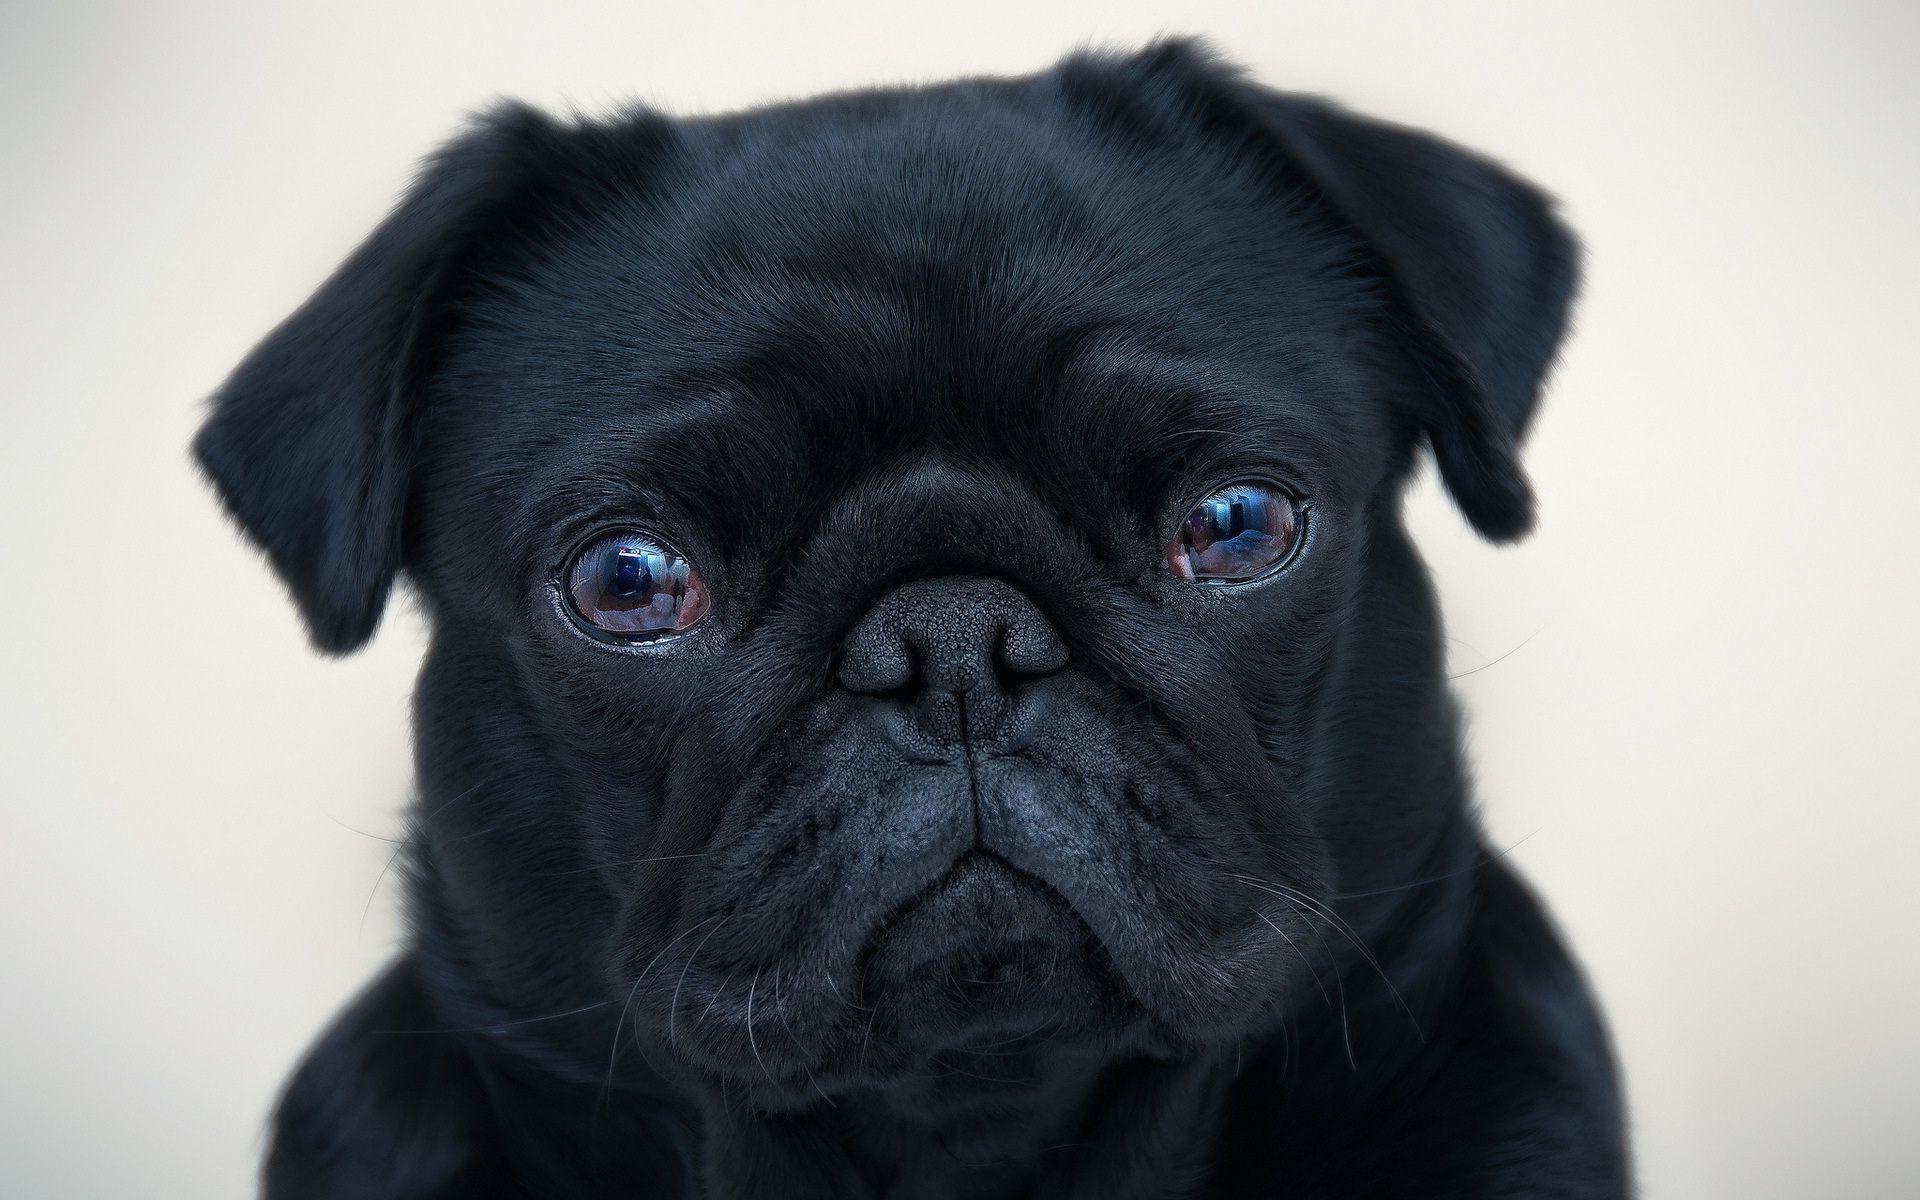 Black pug wallpaper 20673 1920x1200